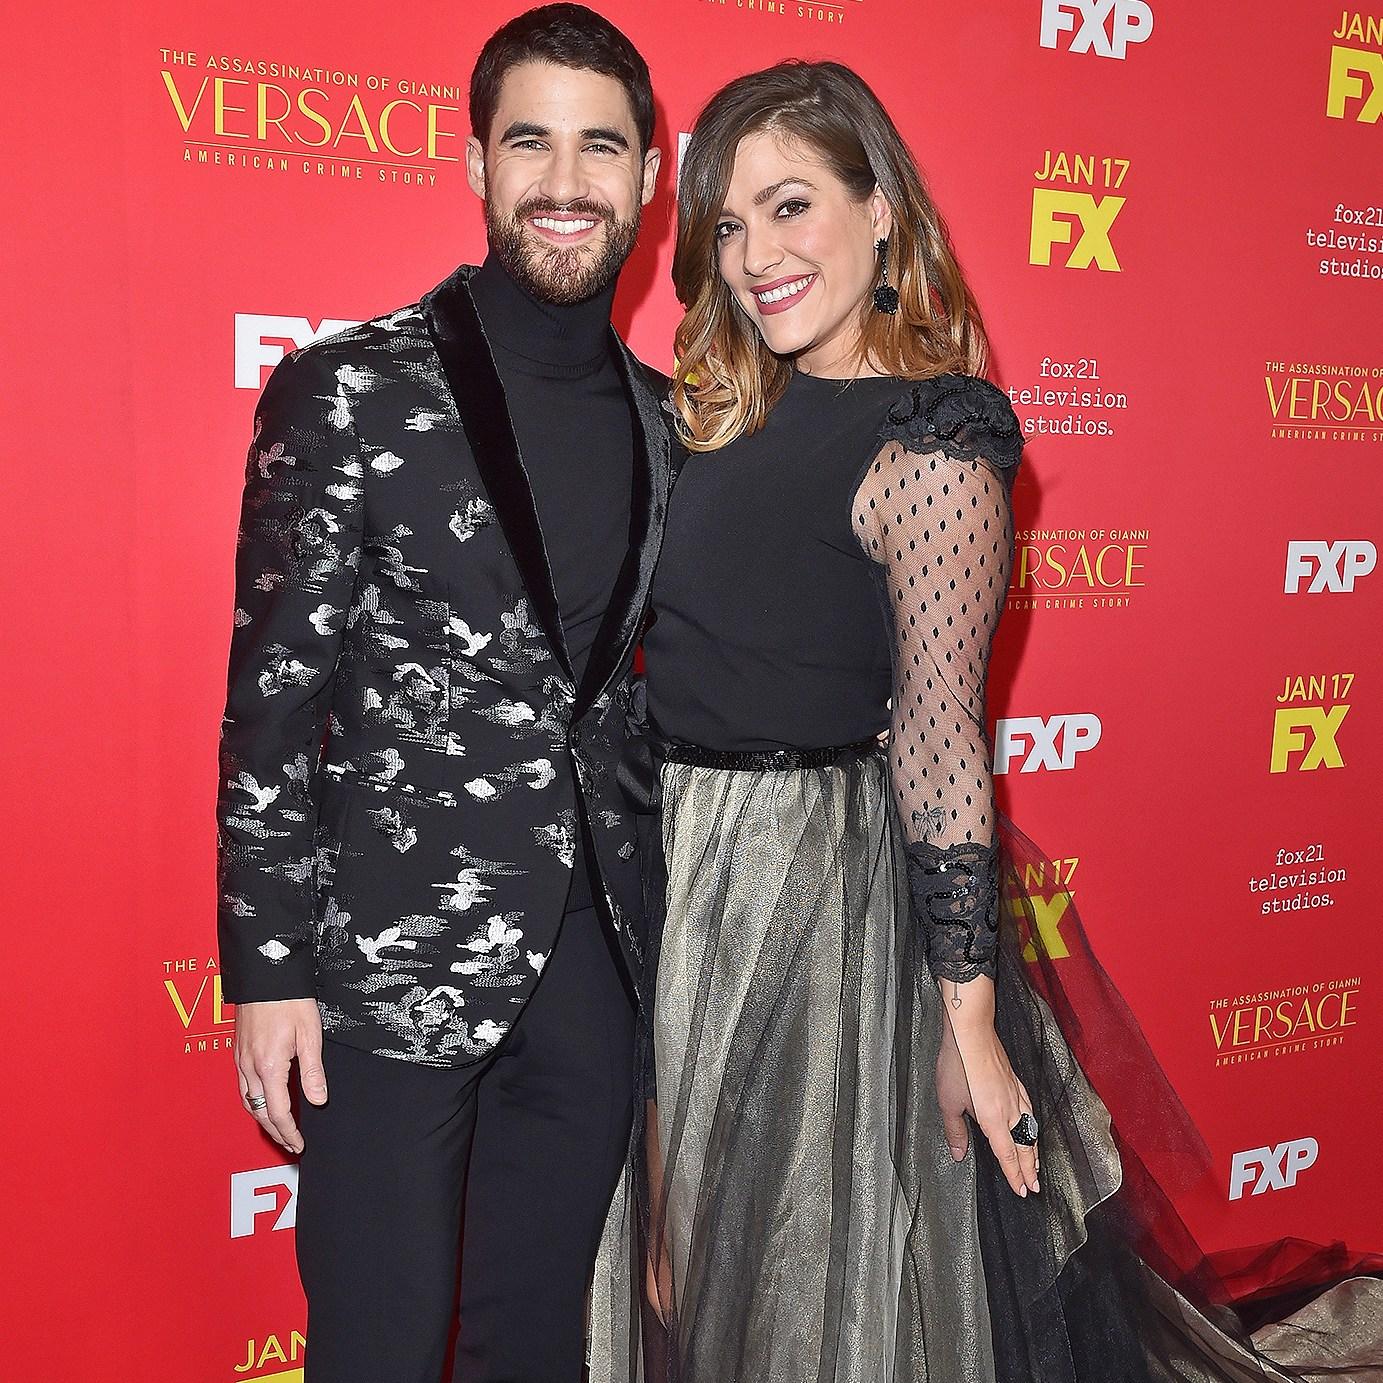 Darren Criss, Mia Swier, Engaged, Assassination of Gianni Versace